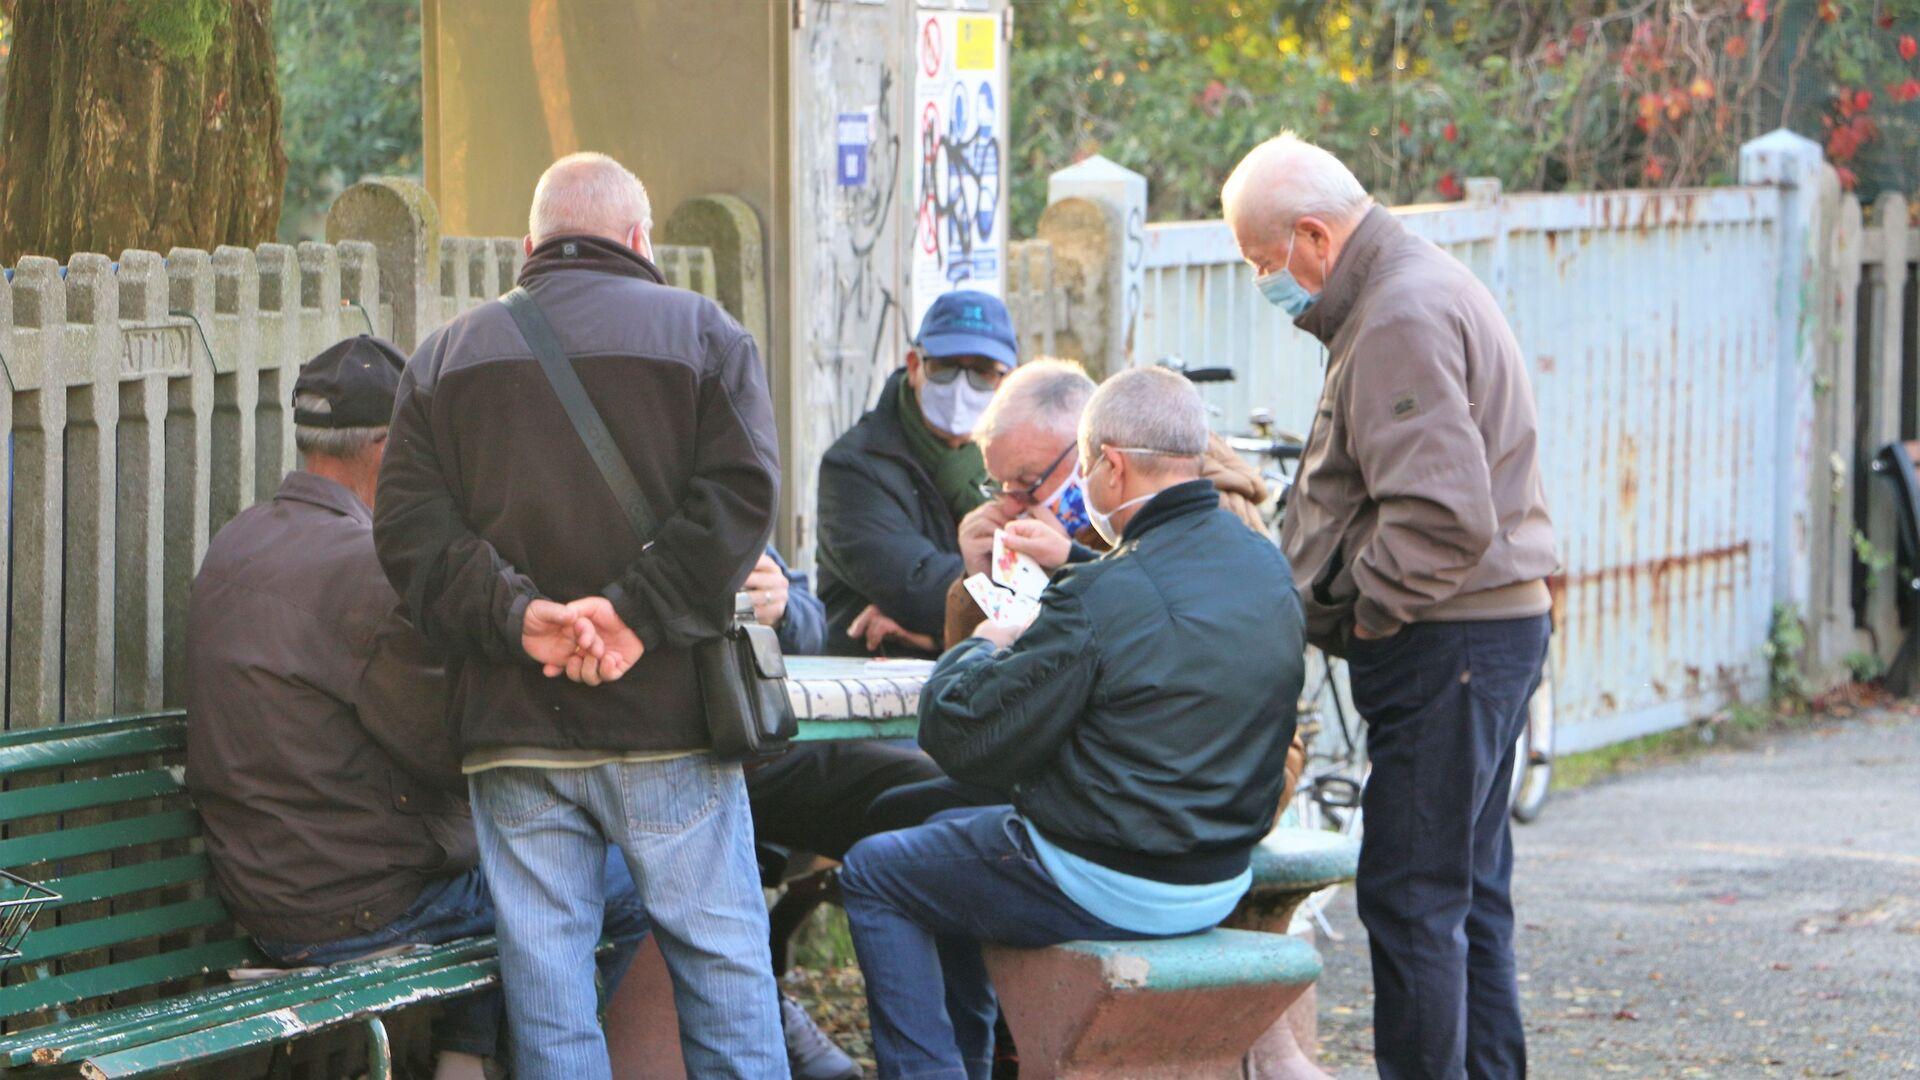 I pensionati giocano a carte in una strada  - Sputnik Italia, 1920, 21.07.2021